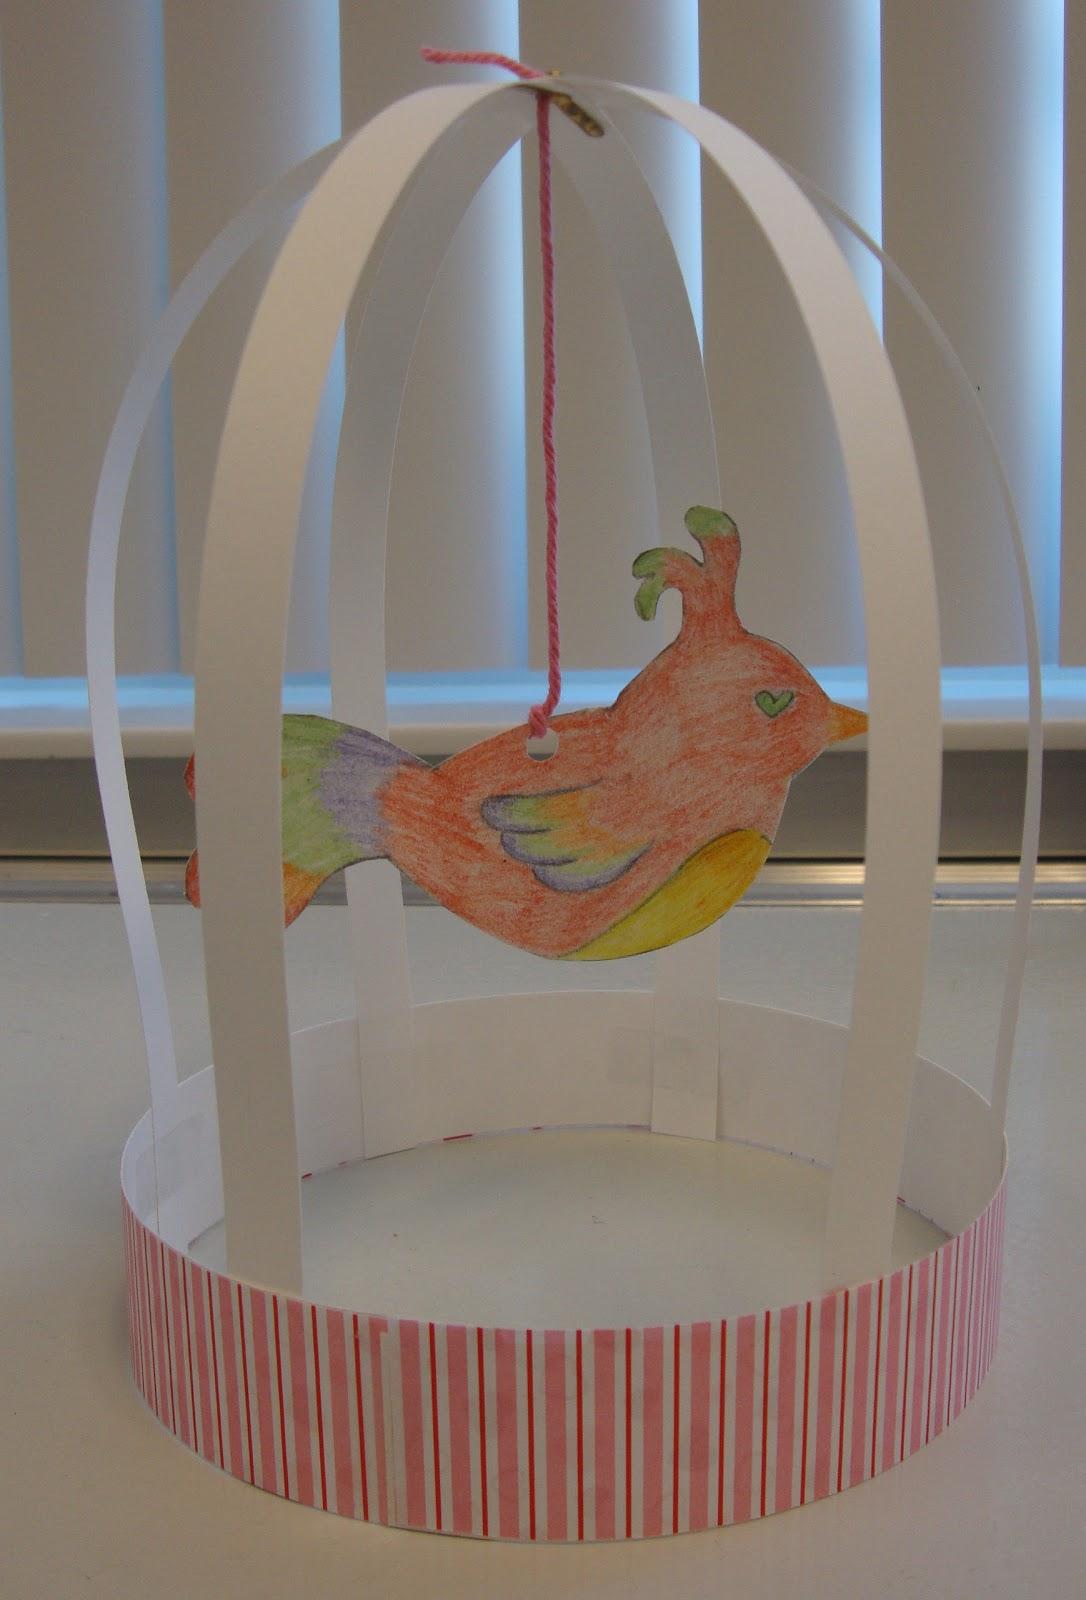 Art paper scissors glue bird cage sculptures for Birdhouse project